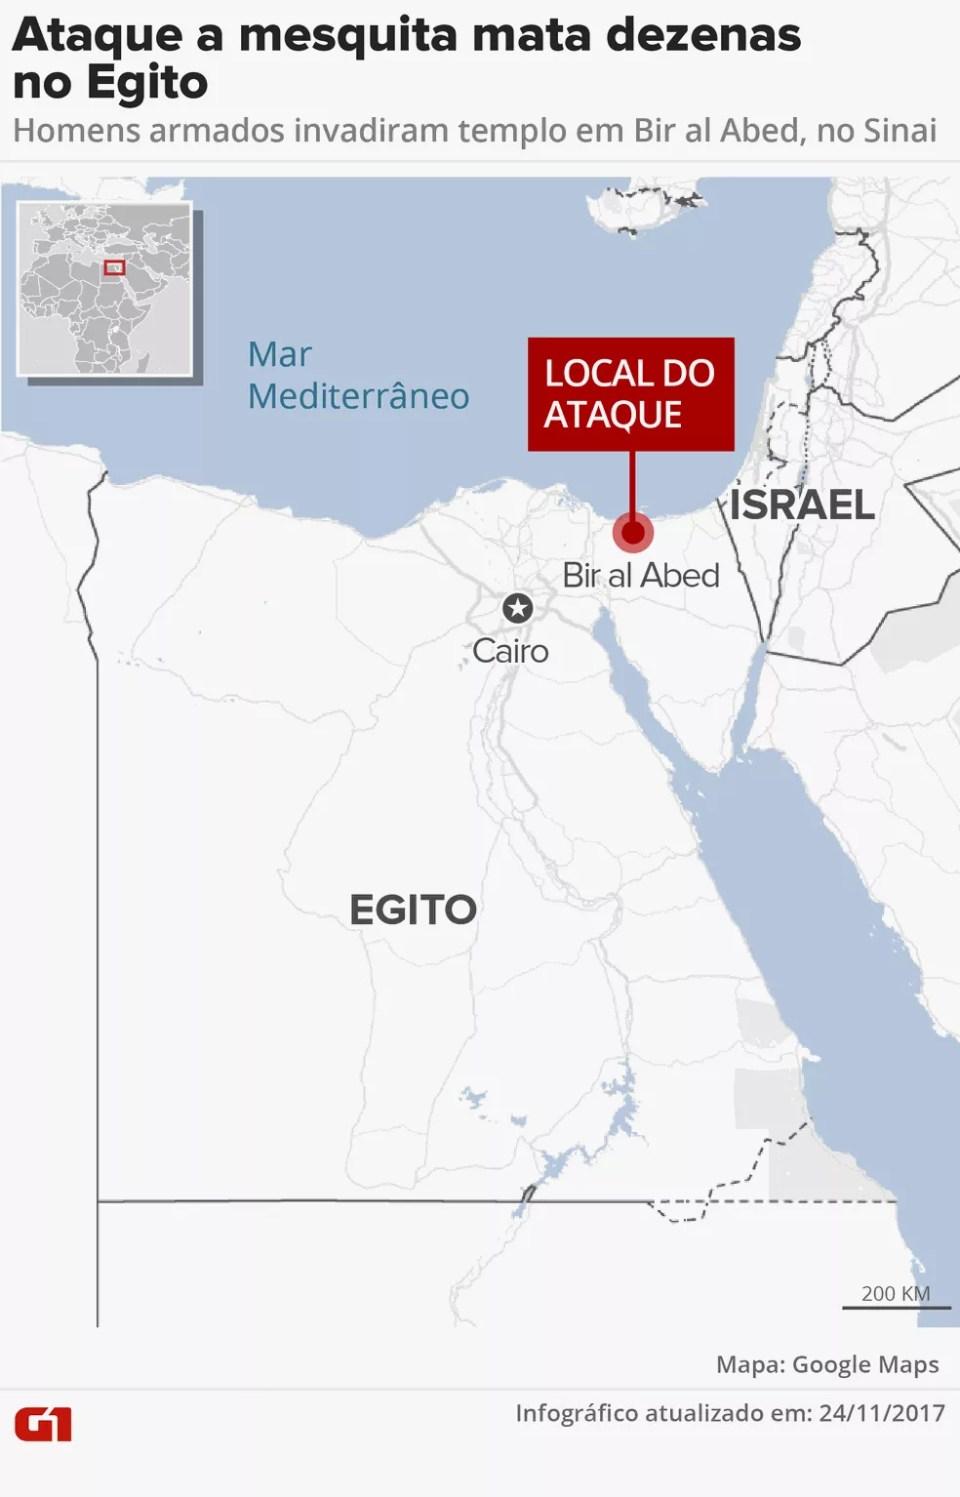 Ataque a mesquita mata dezenas no Egito (Foto: Karina Almeida/G1)